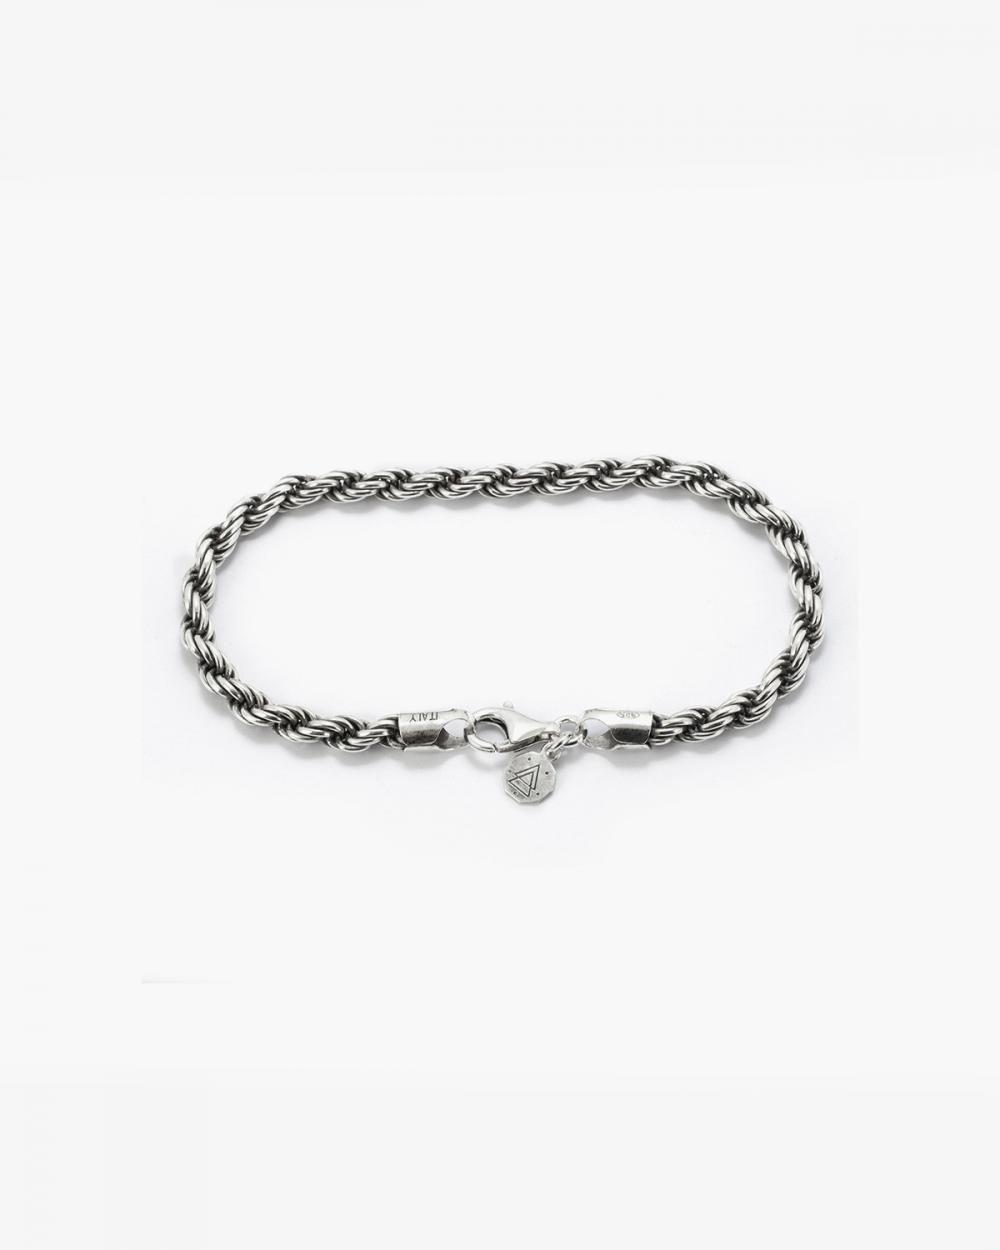 Bracelets TORCHON BRACELET 070 NOVE25